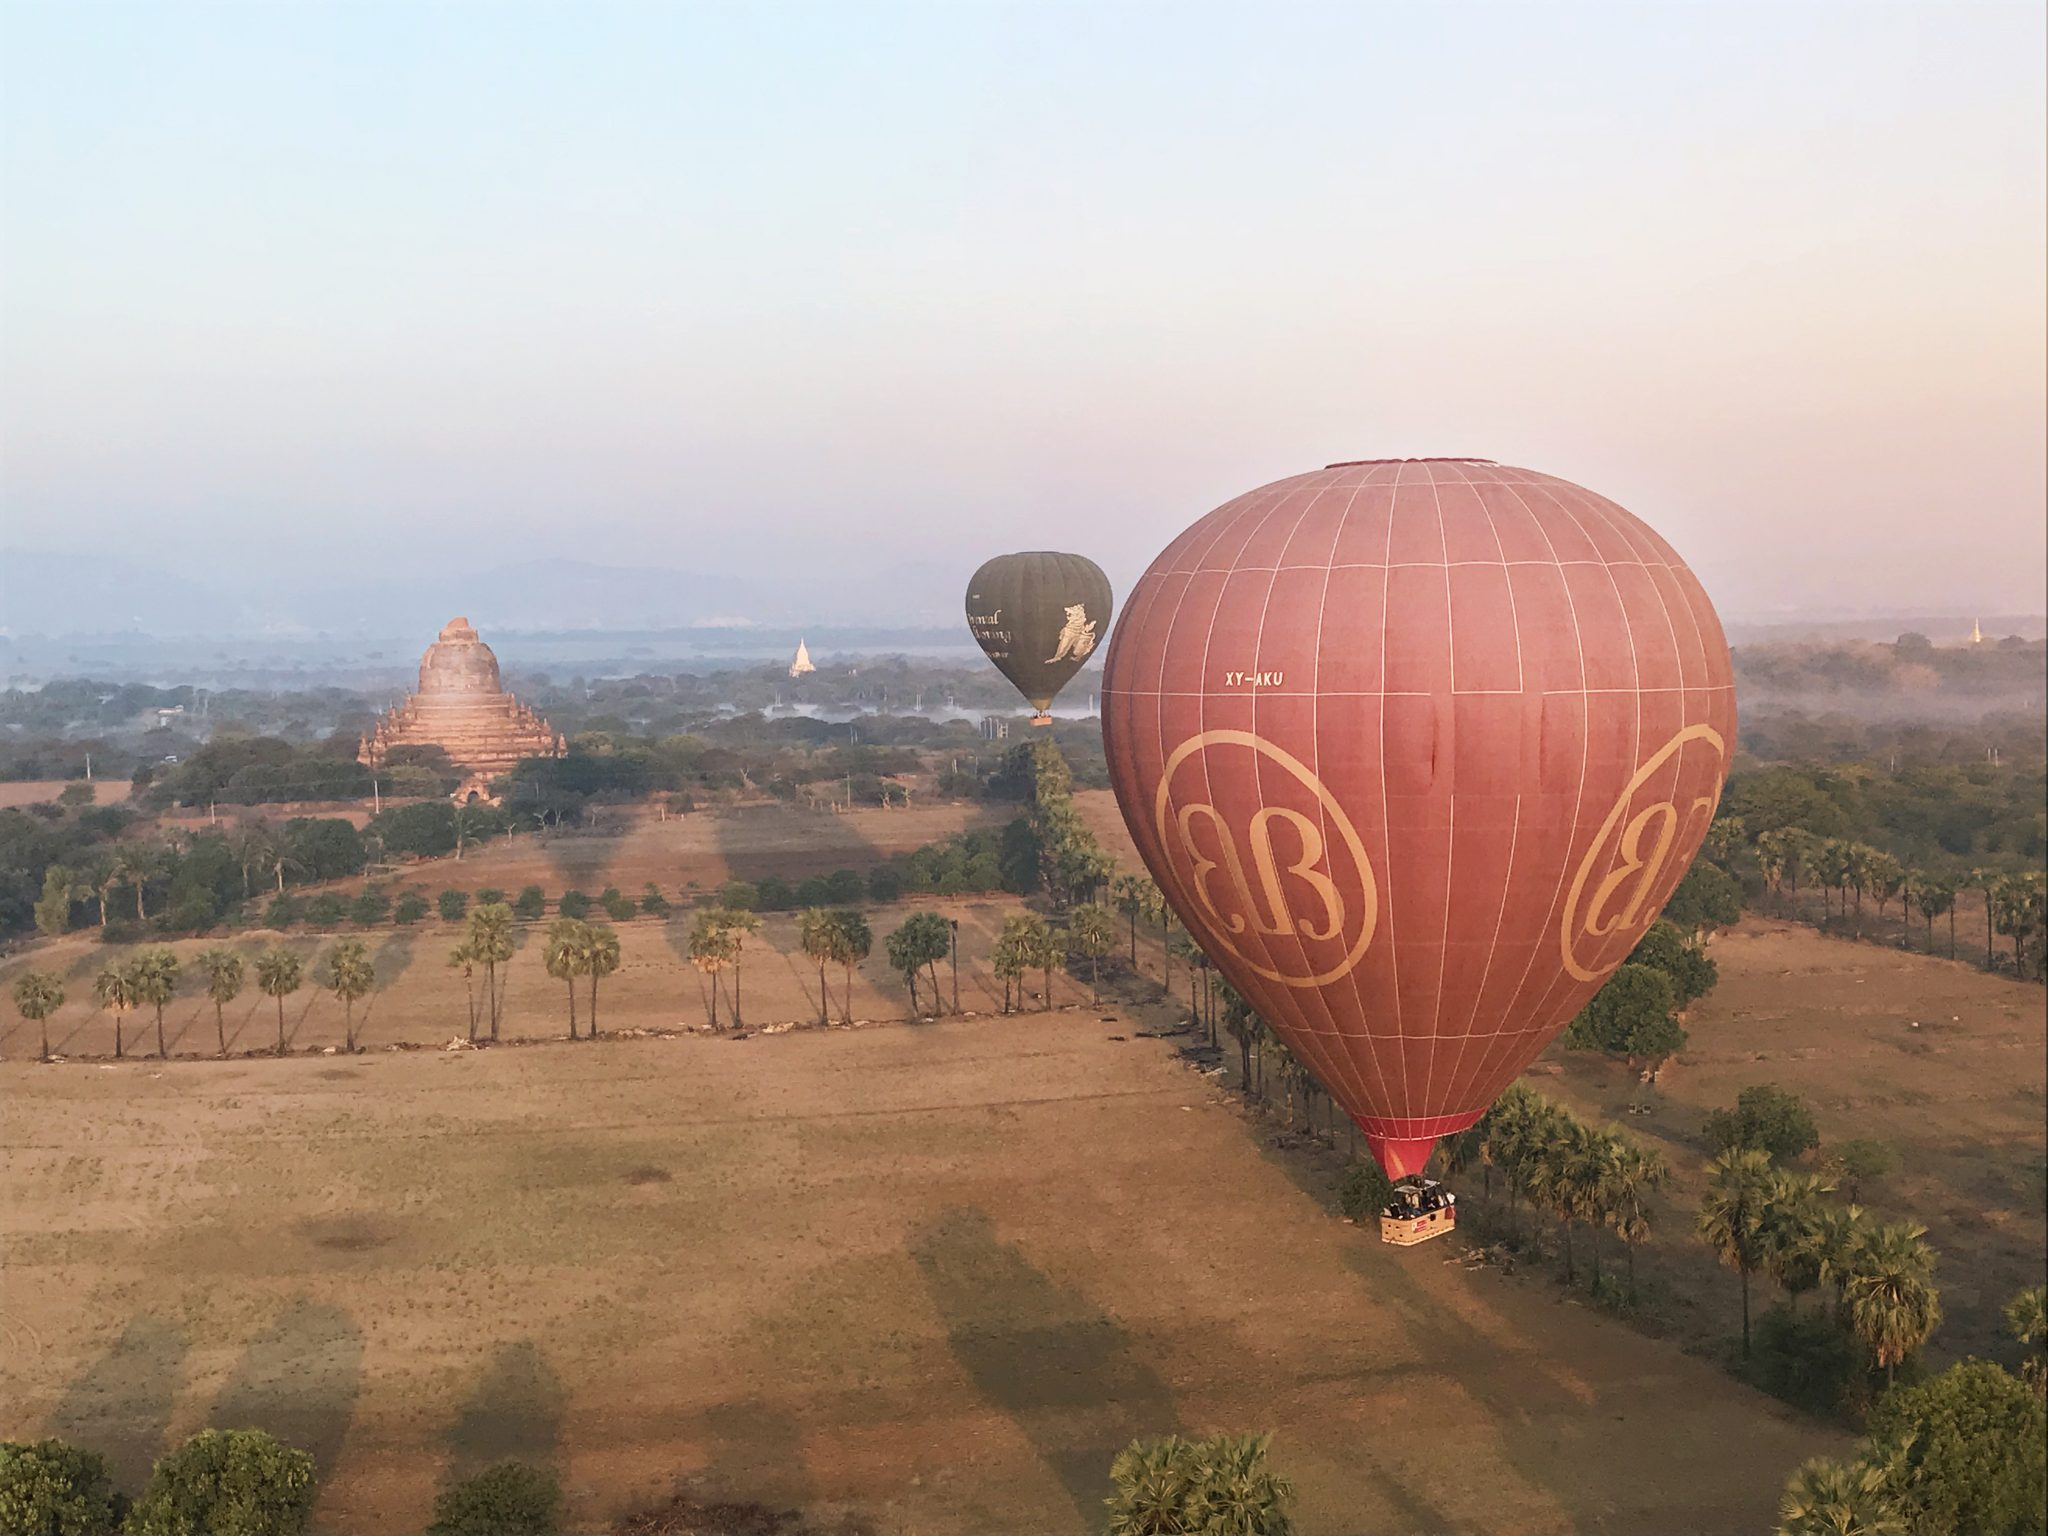 bagan balony 2 - Myanmar informacje ogóle